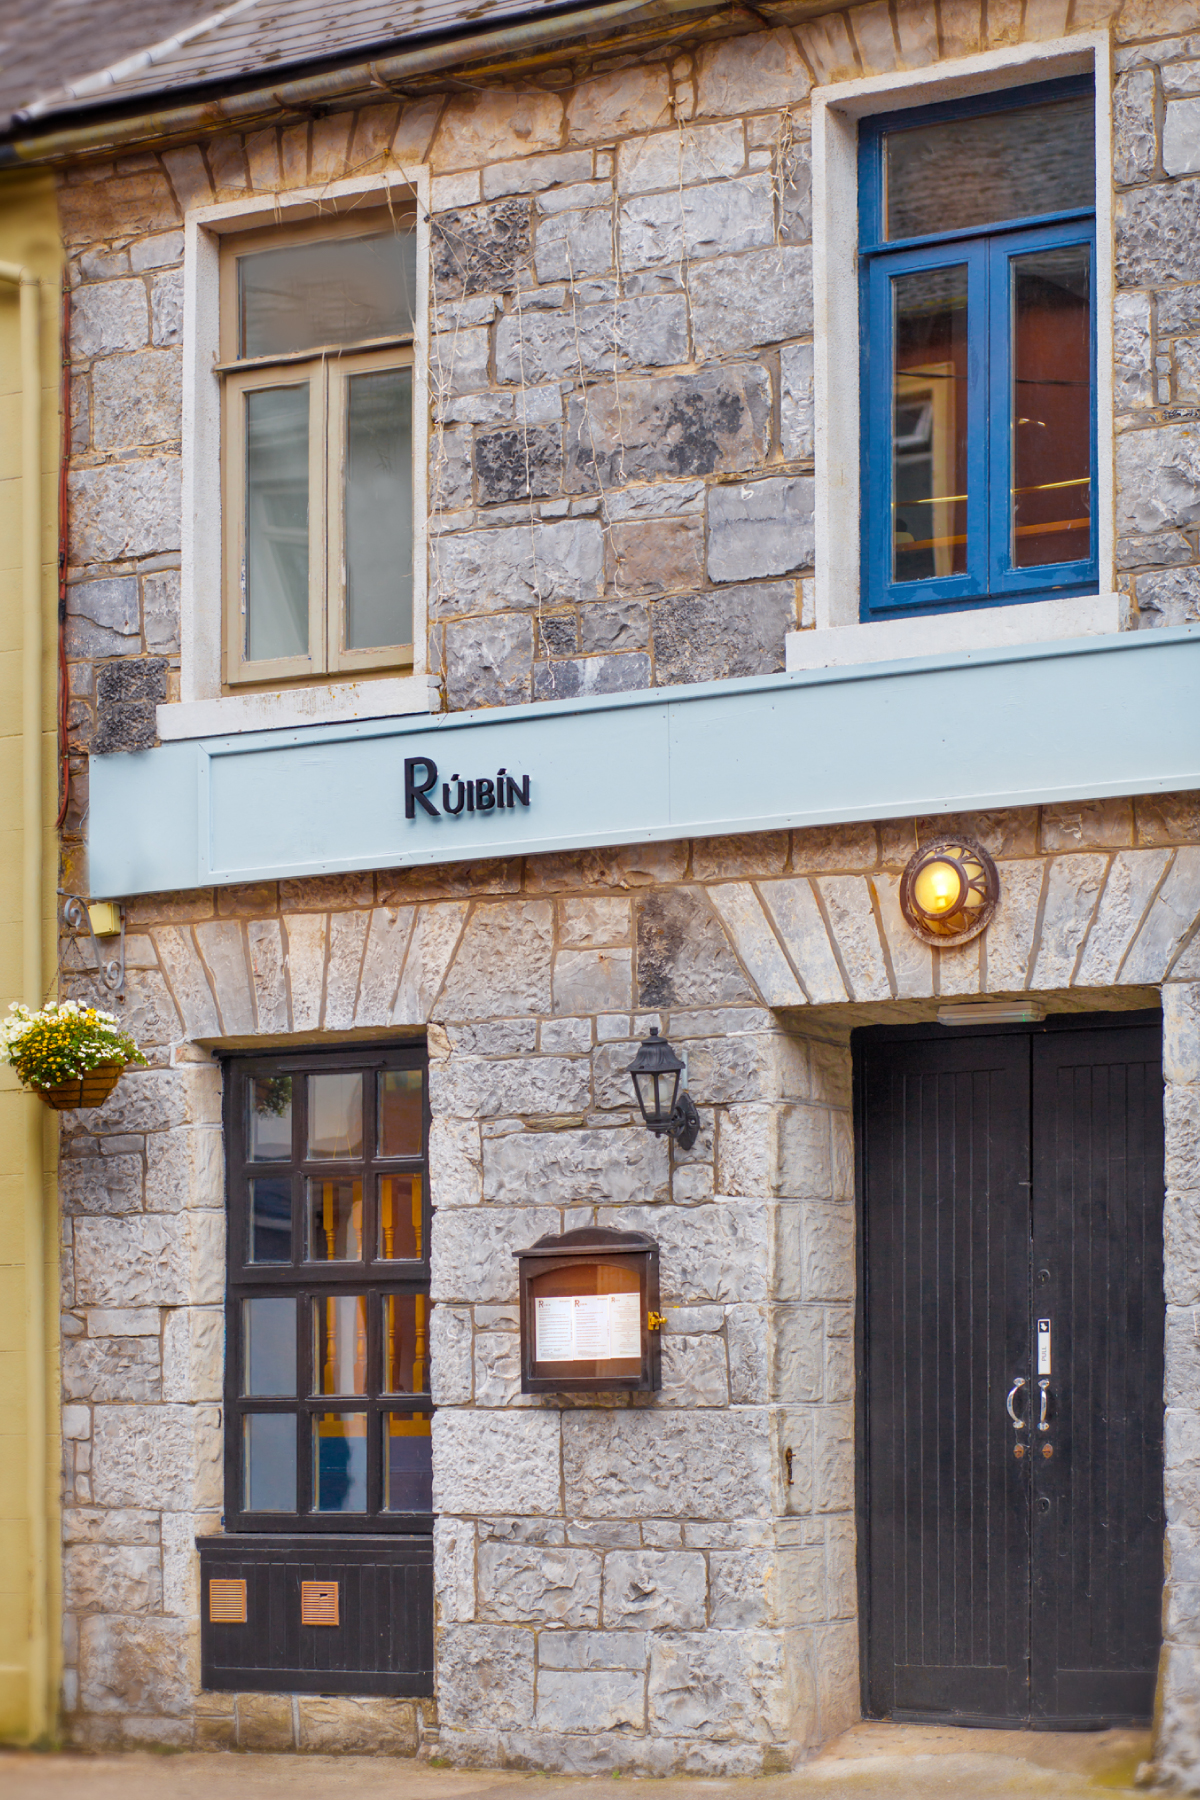 Ruibin Galway Focaccia Bread Recipe